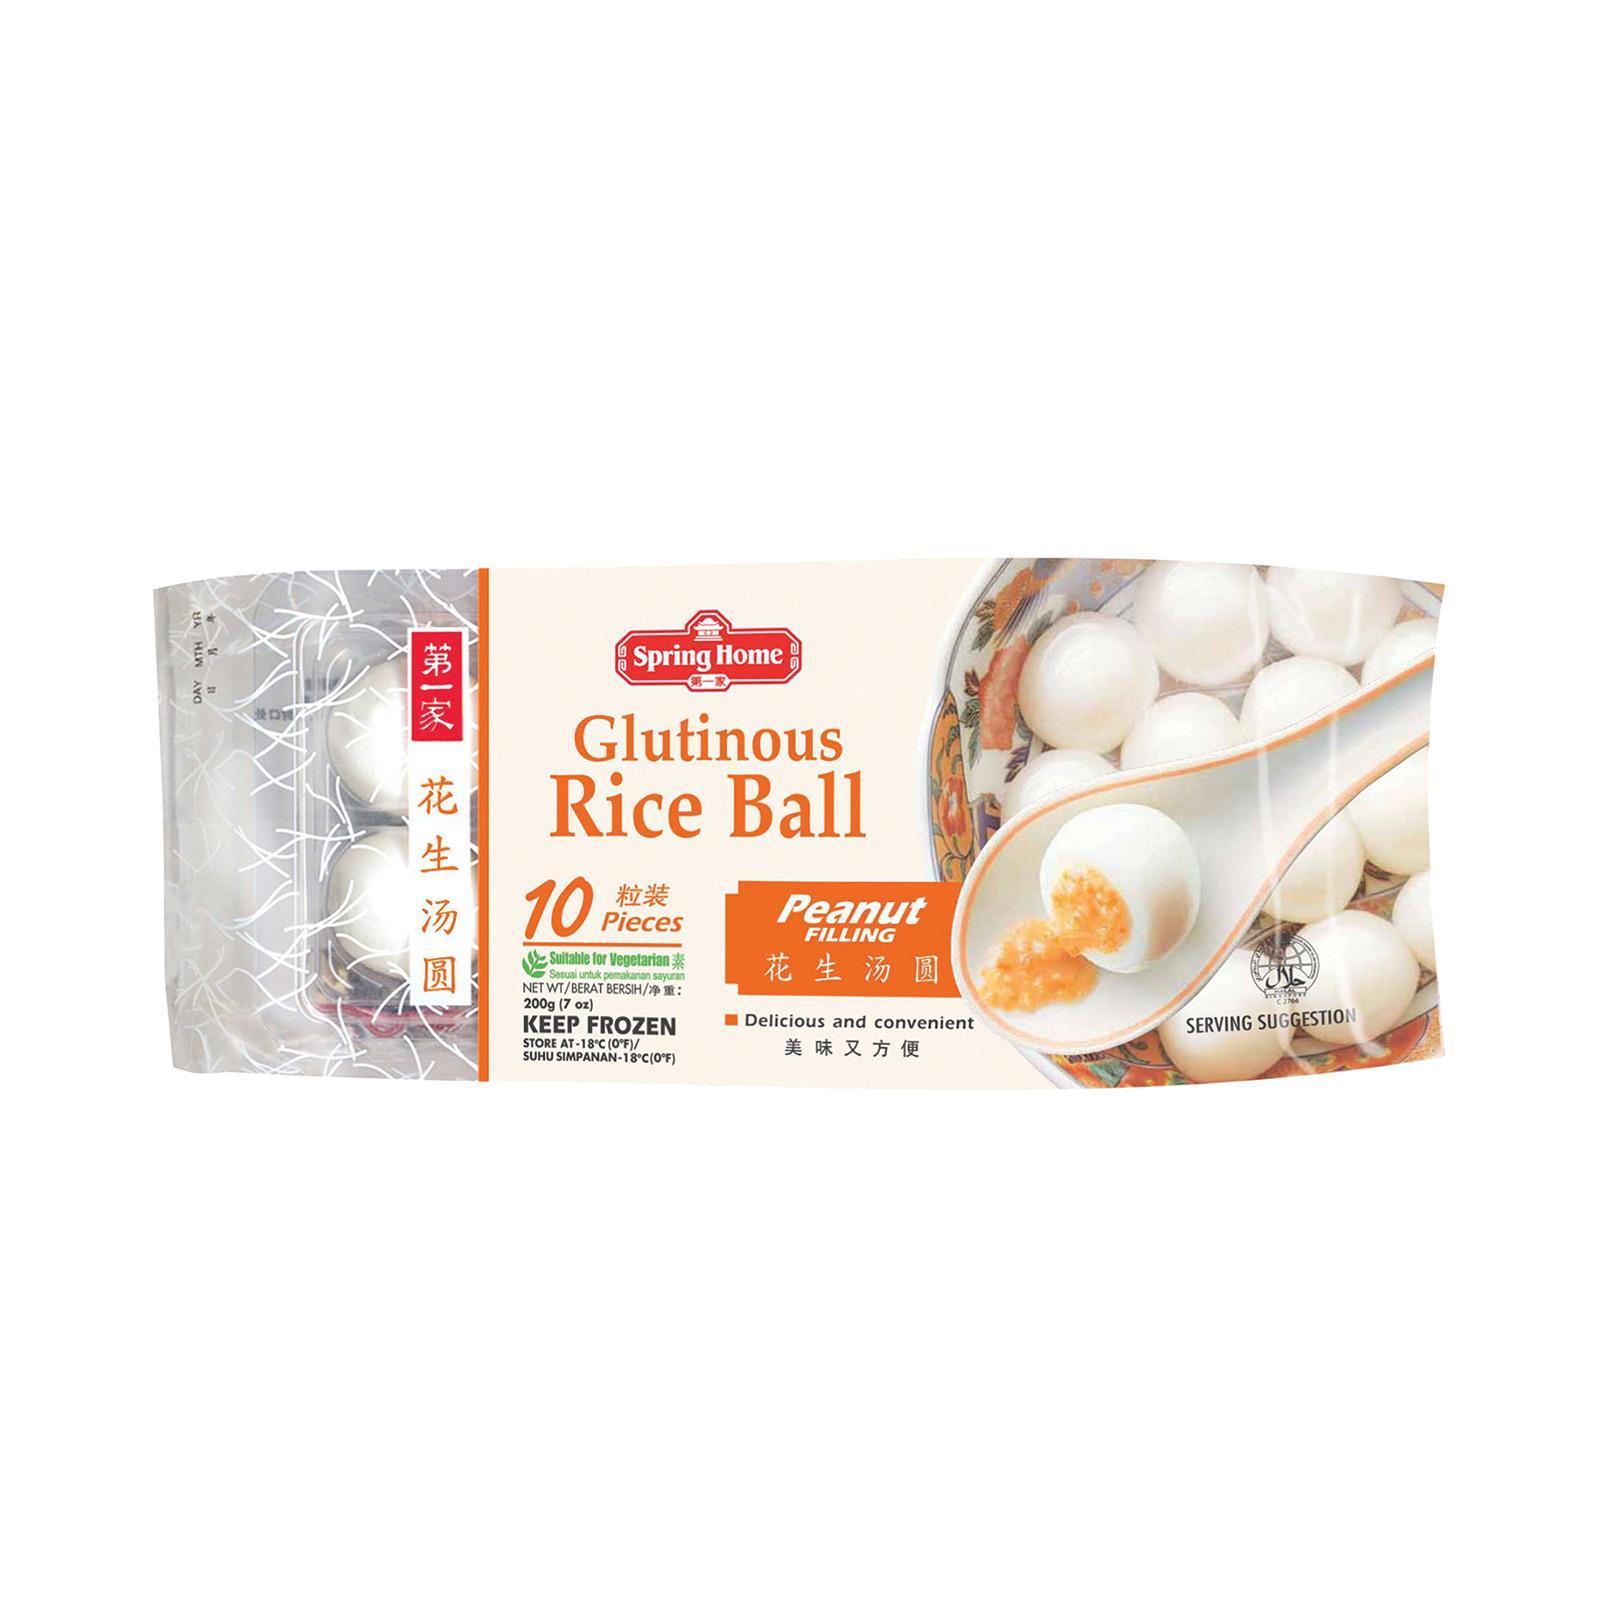 Spring Home Glutinous Rice Ball - Peanut (10 Pcs) - Frozen By Redmart.